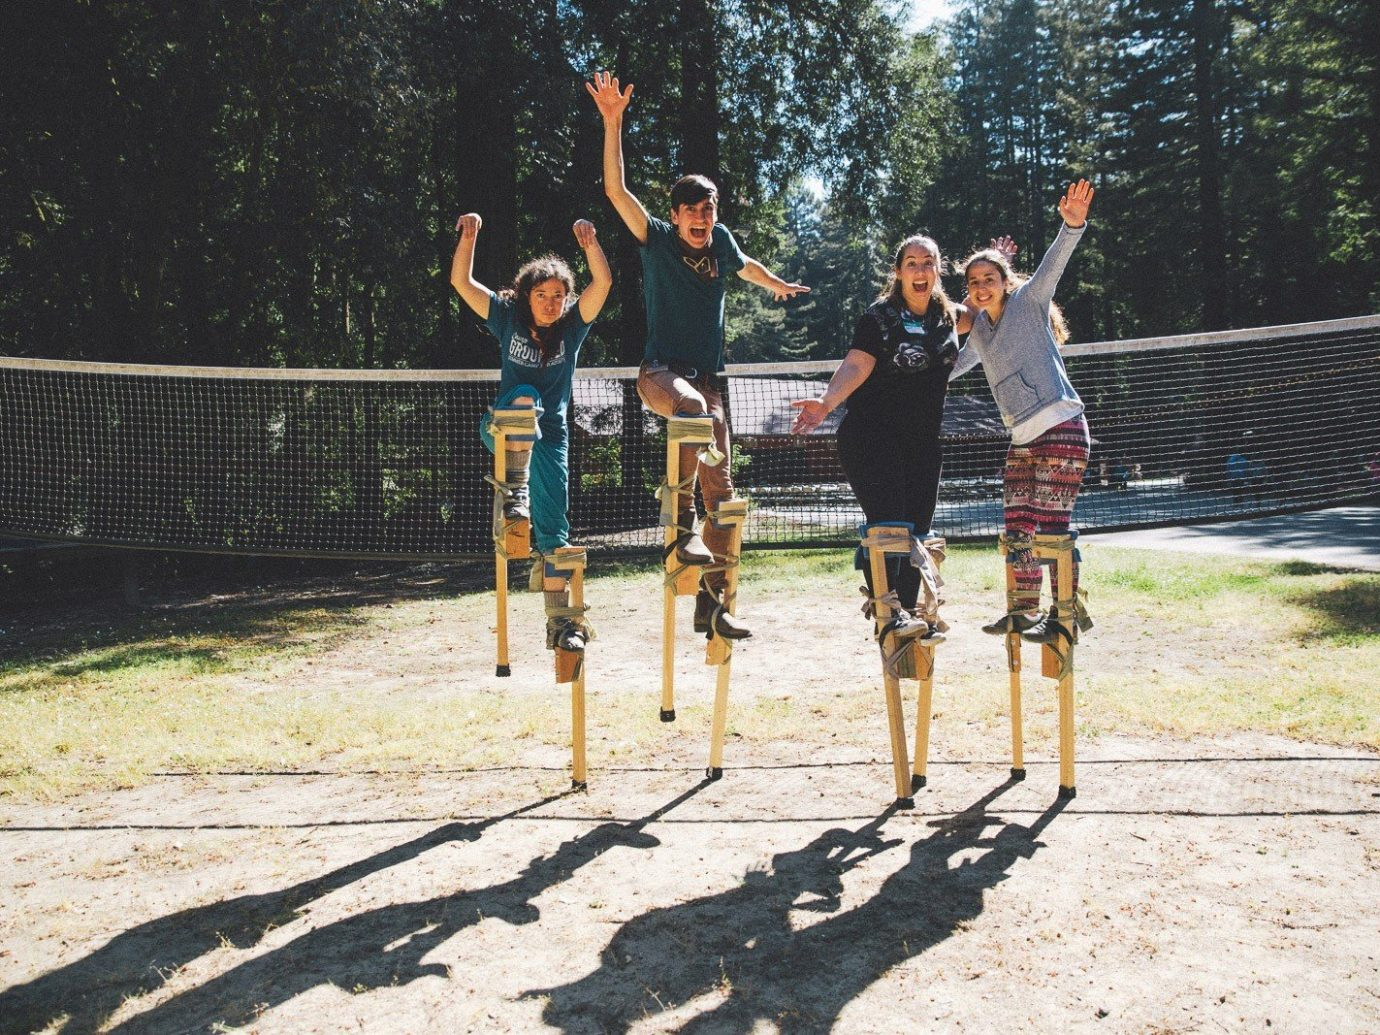 Offbeat outdoor ground tree person Sport sports endurance sports jumping cyclo cross duathlon